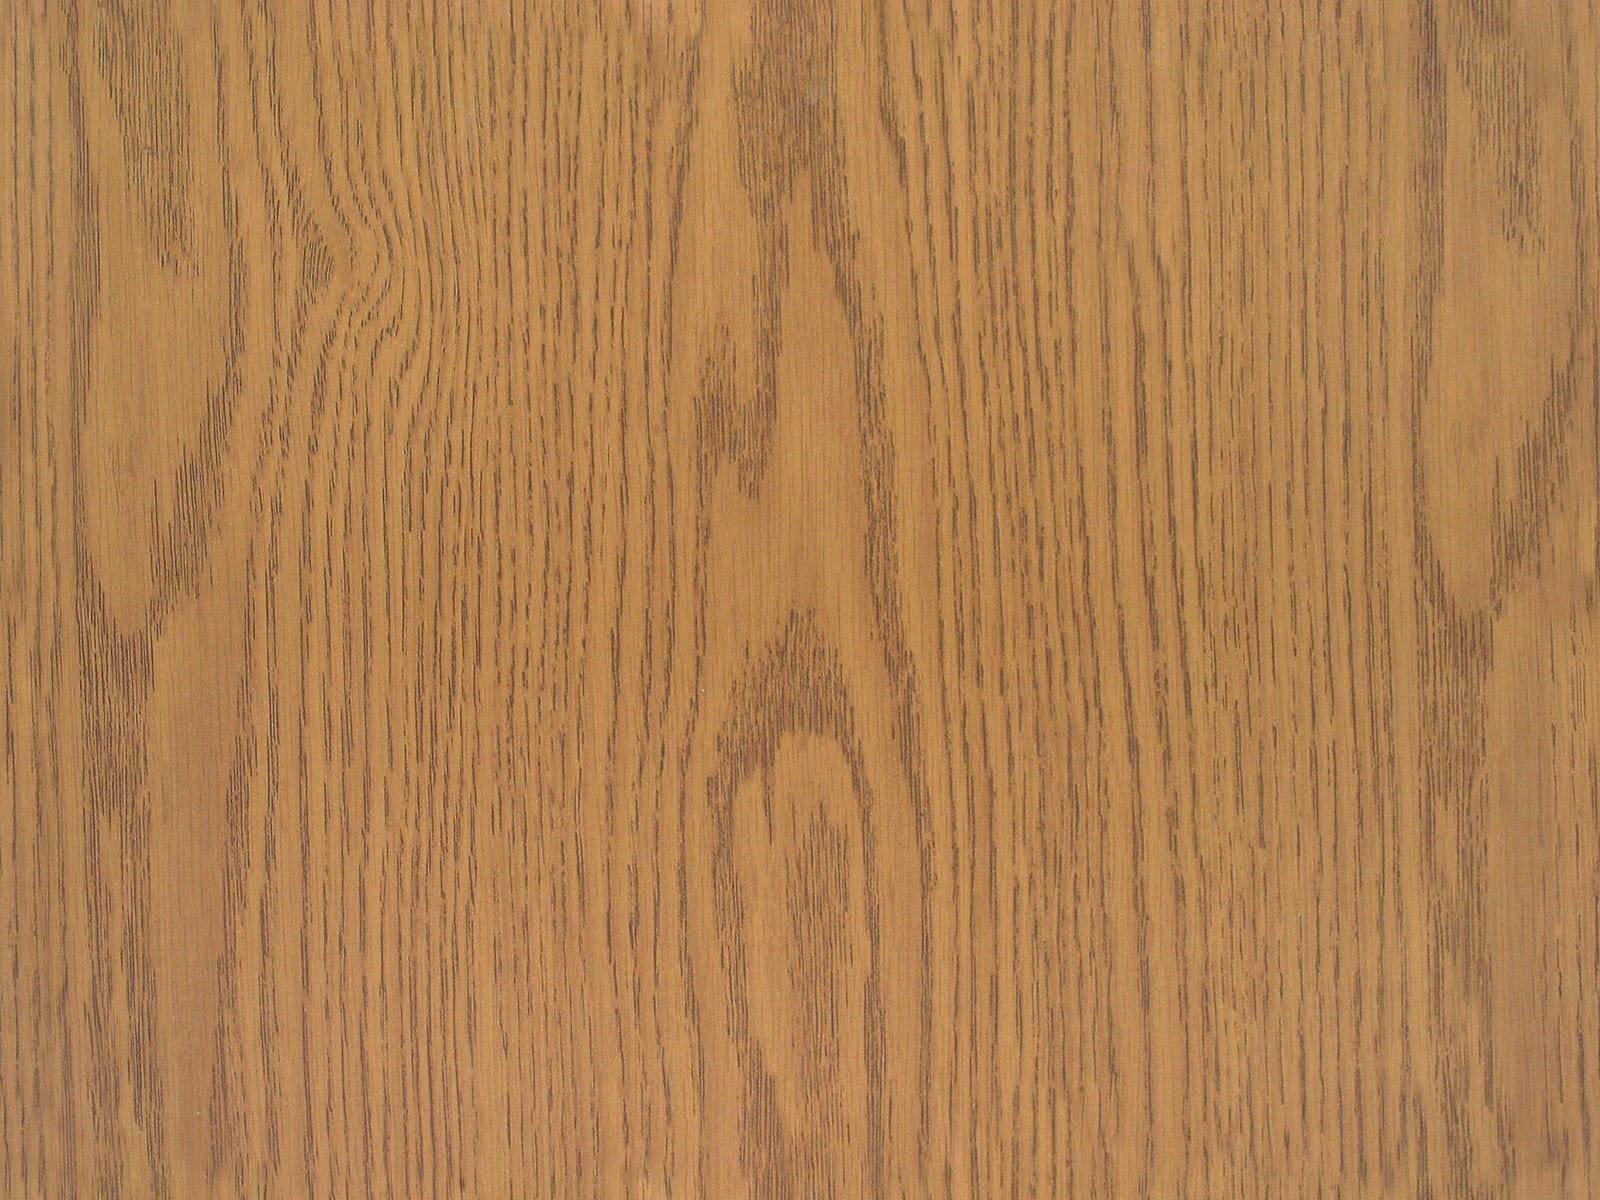 Seamless Fine Wood Texture Maps